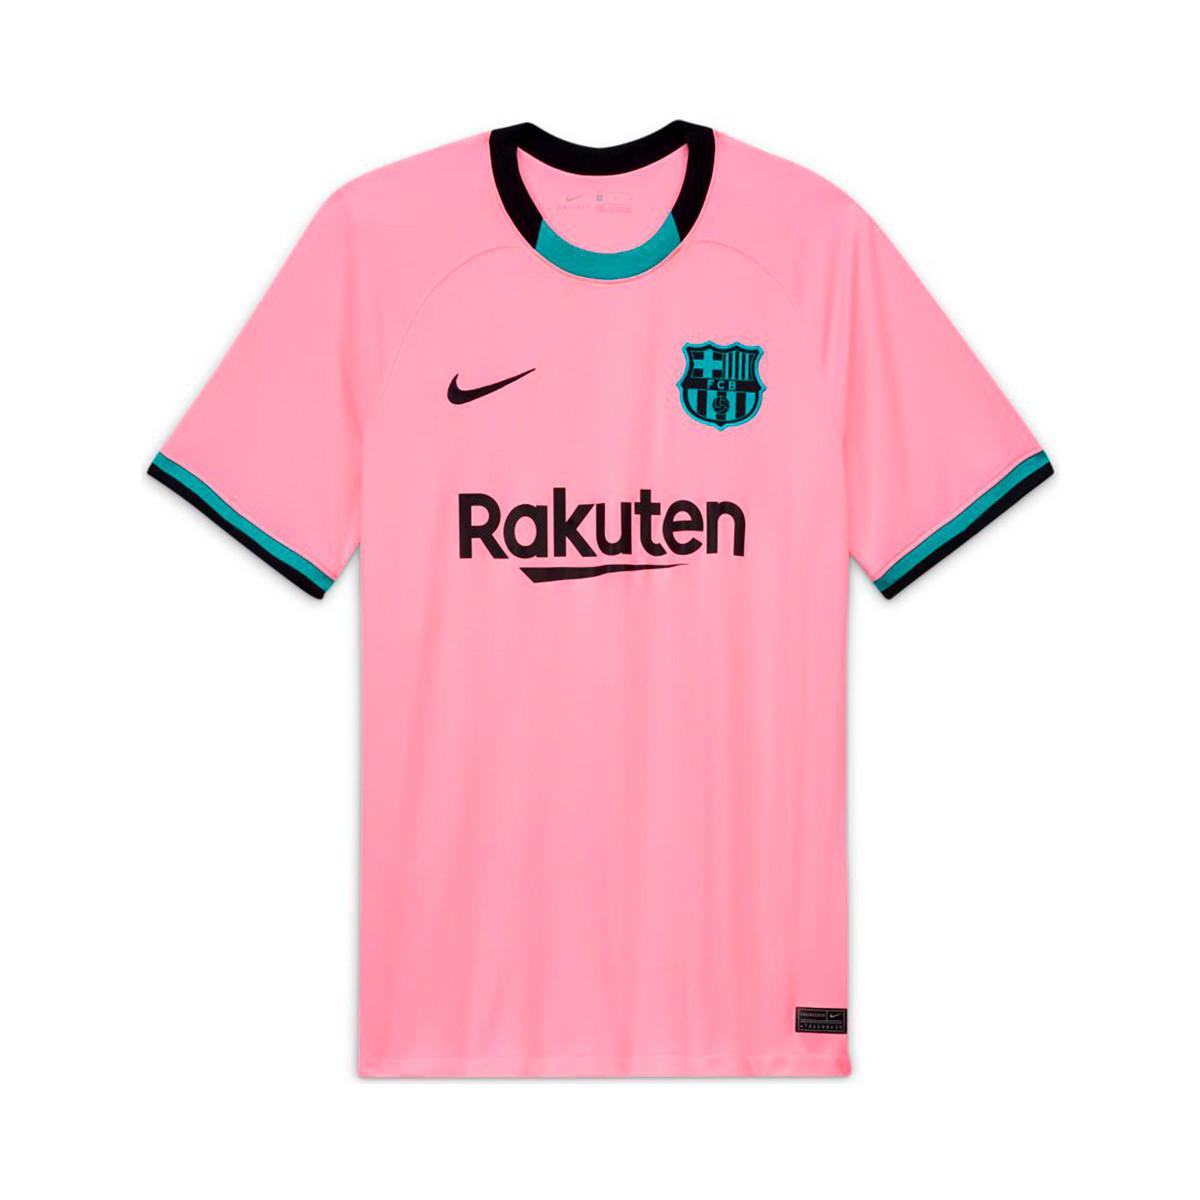 jersey nike fc barcelona stadium tercera equipacion 2020 2021 pink beam black football store futbol emotion nike fc barcelona stadium tercera equipacion 2020 2021 jersey